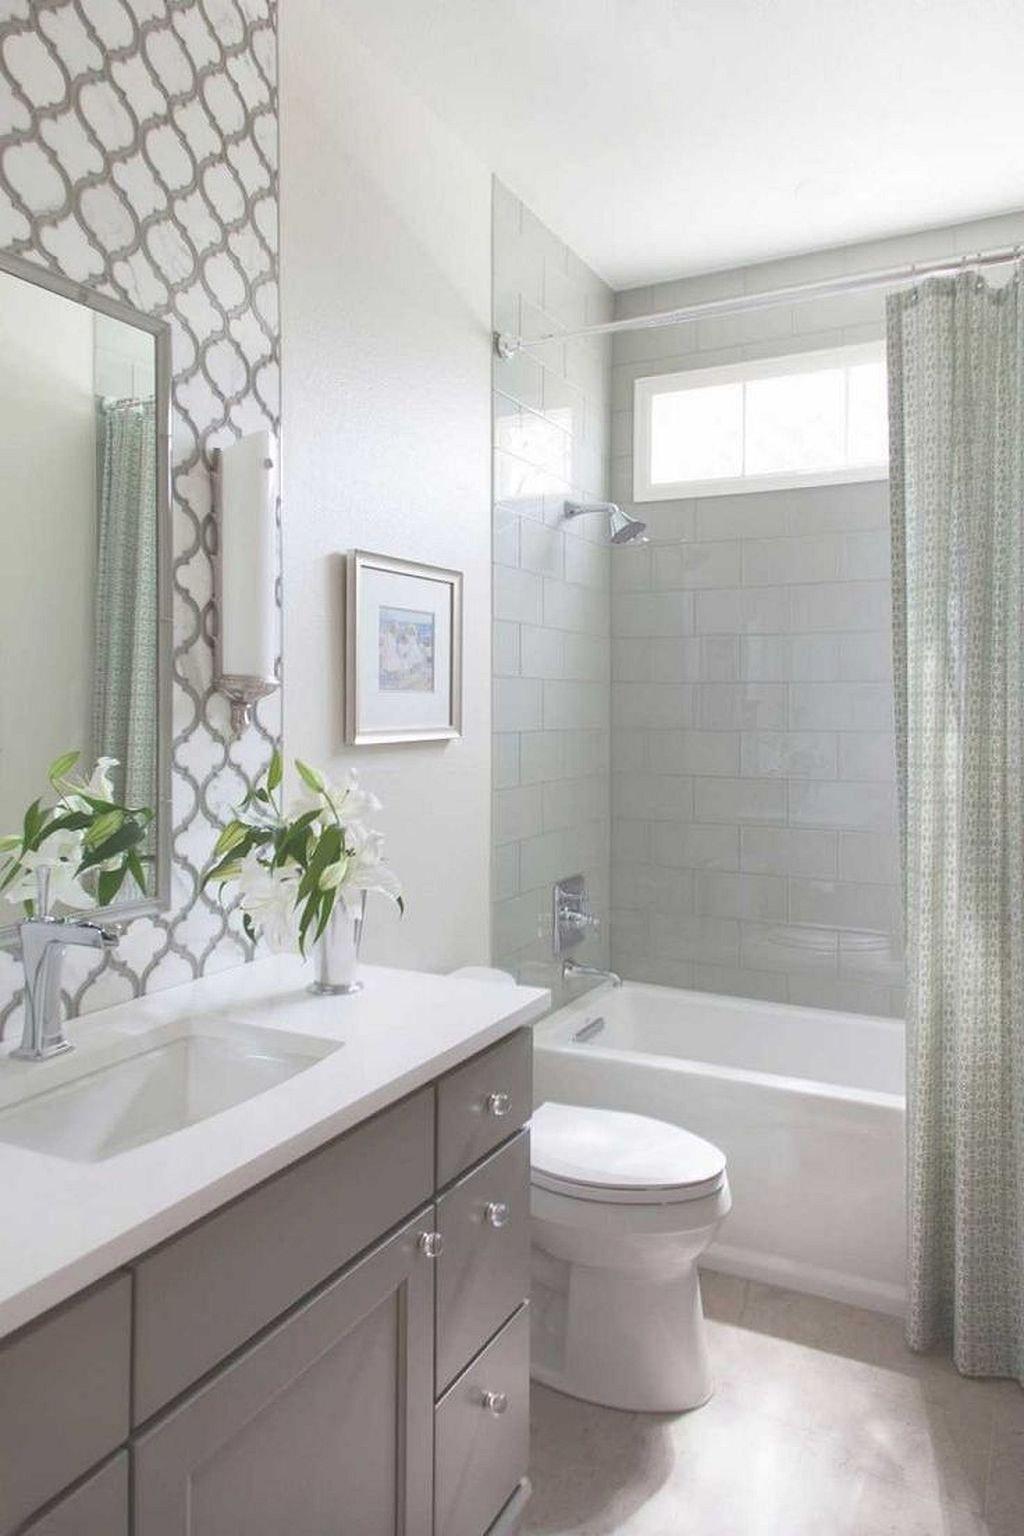 Shower Tub Bathroom Remodeling Ideas Bathroom Tub Shower Combo